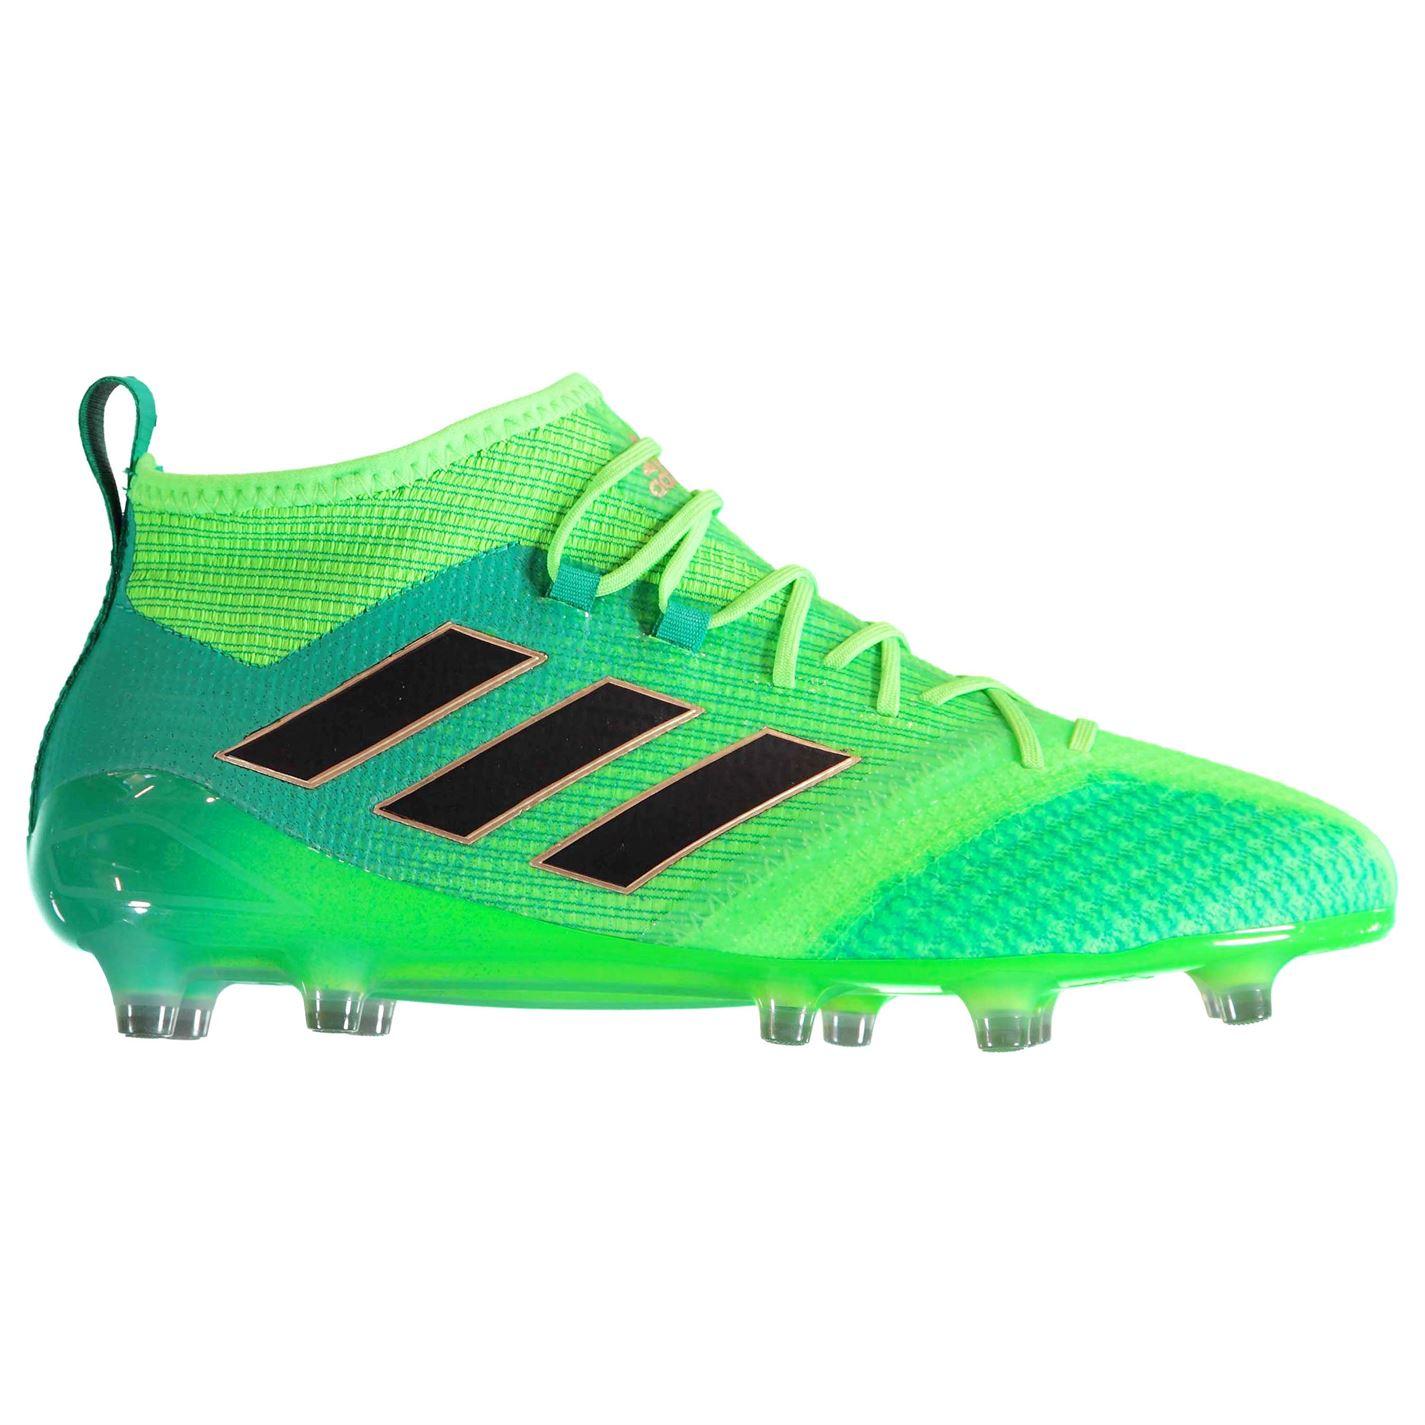 Adidas Ace 17.1 Primeknit FG Football Boots Mens